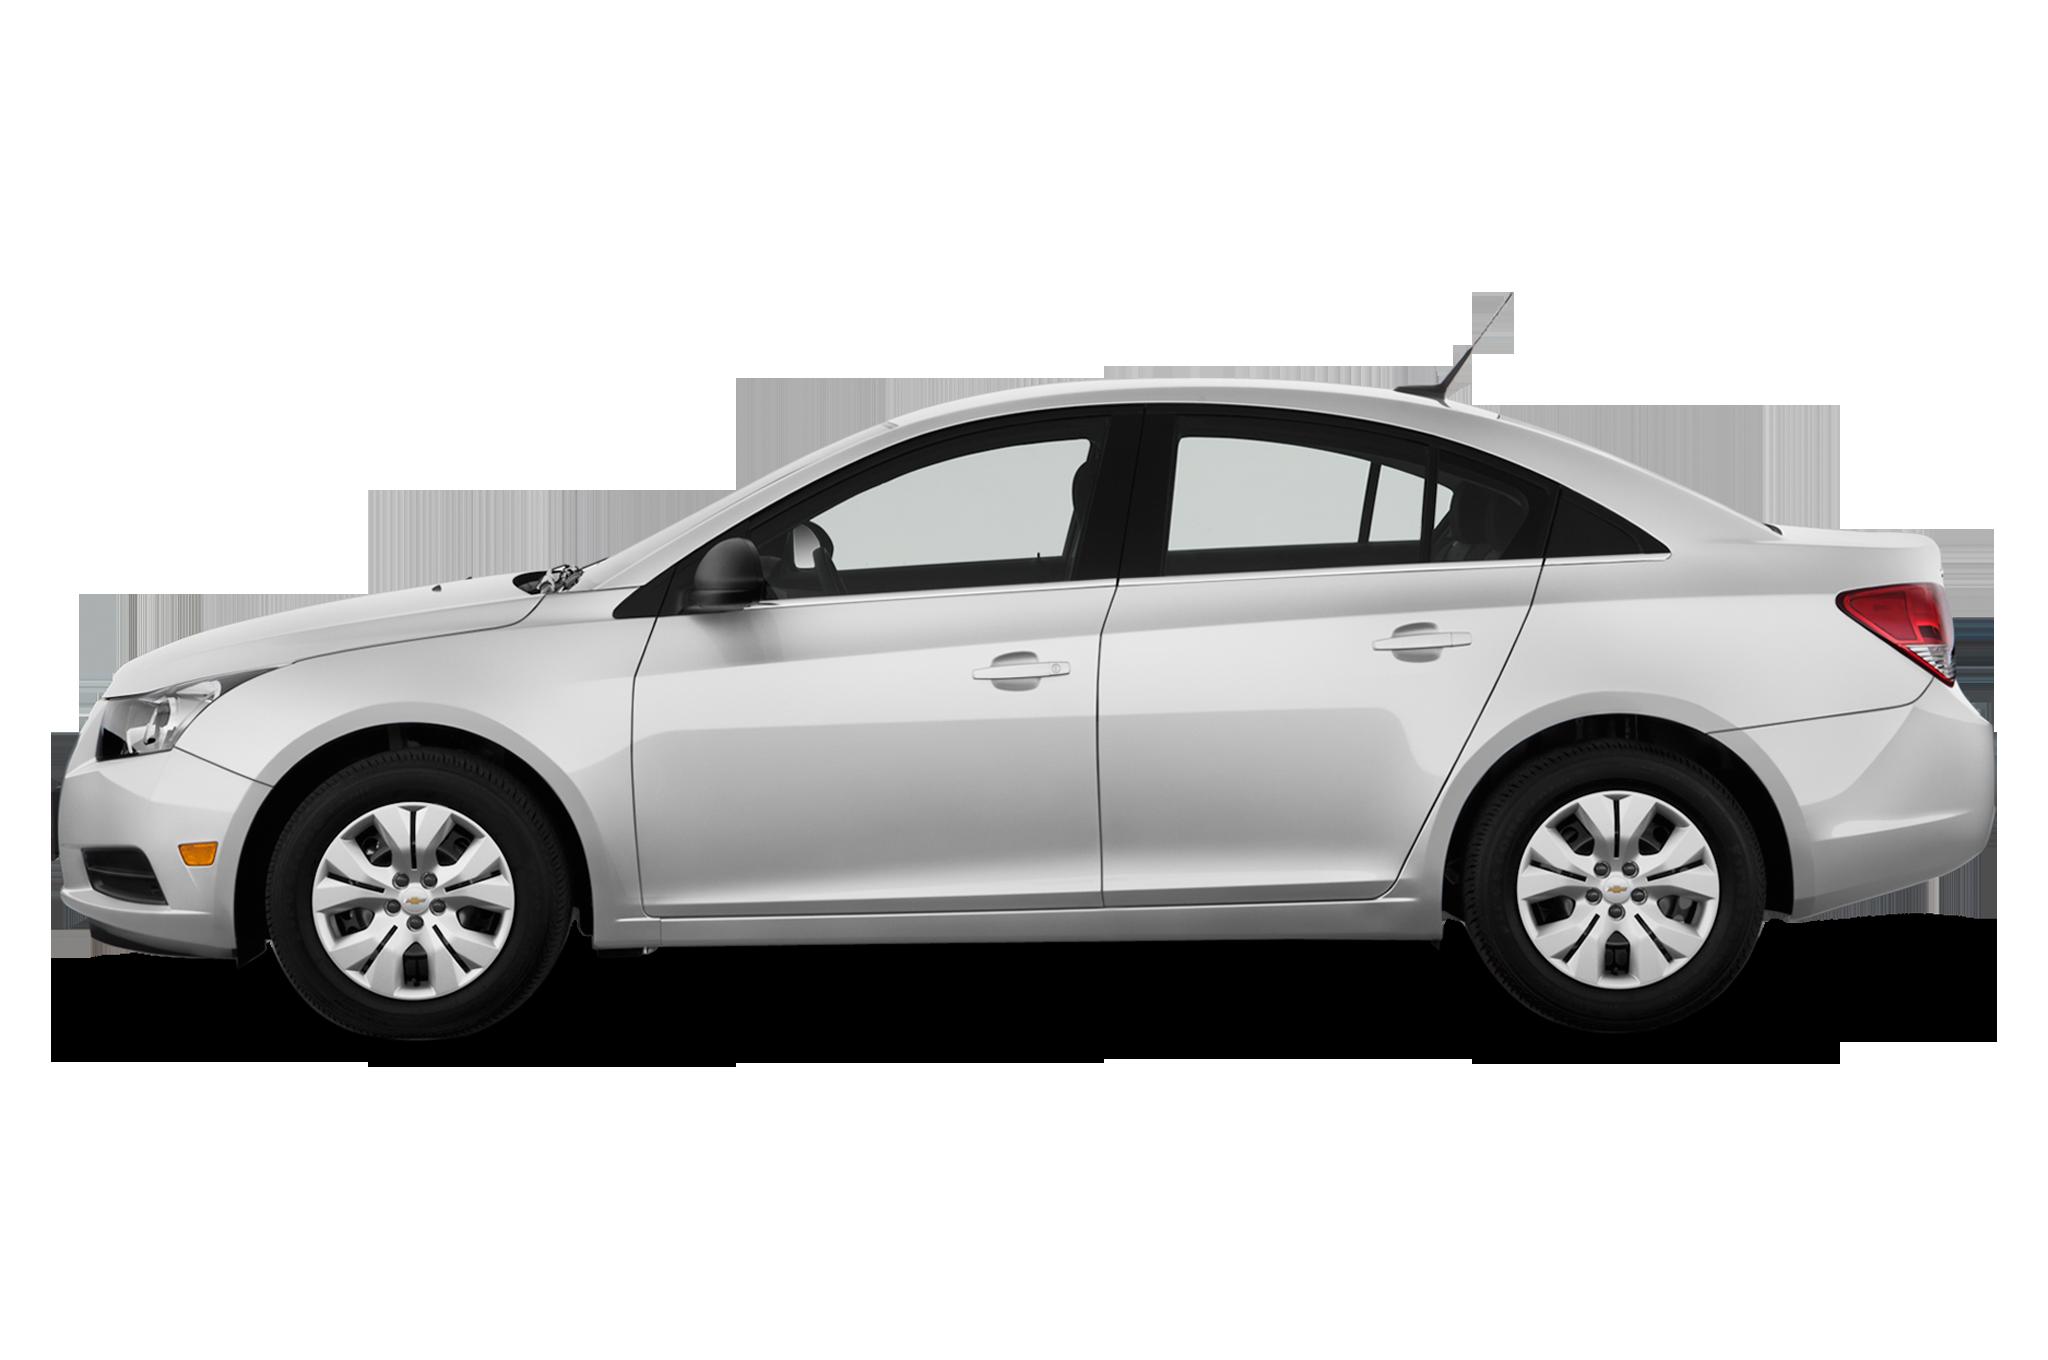 Chevrolet Cruze Png Image Purepng Free Transparent Cc0